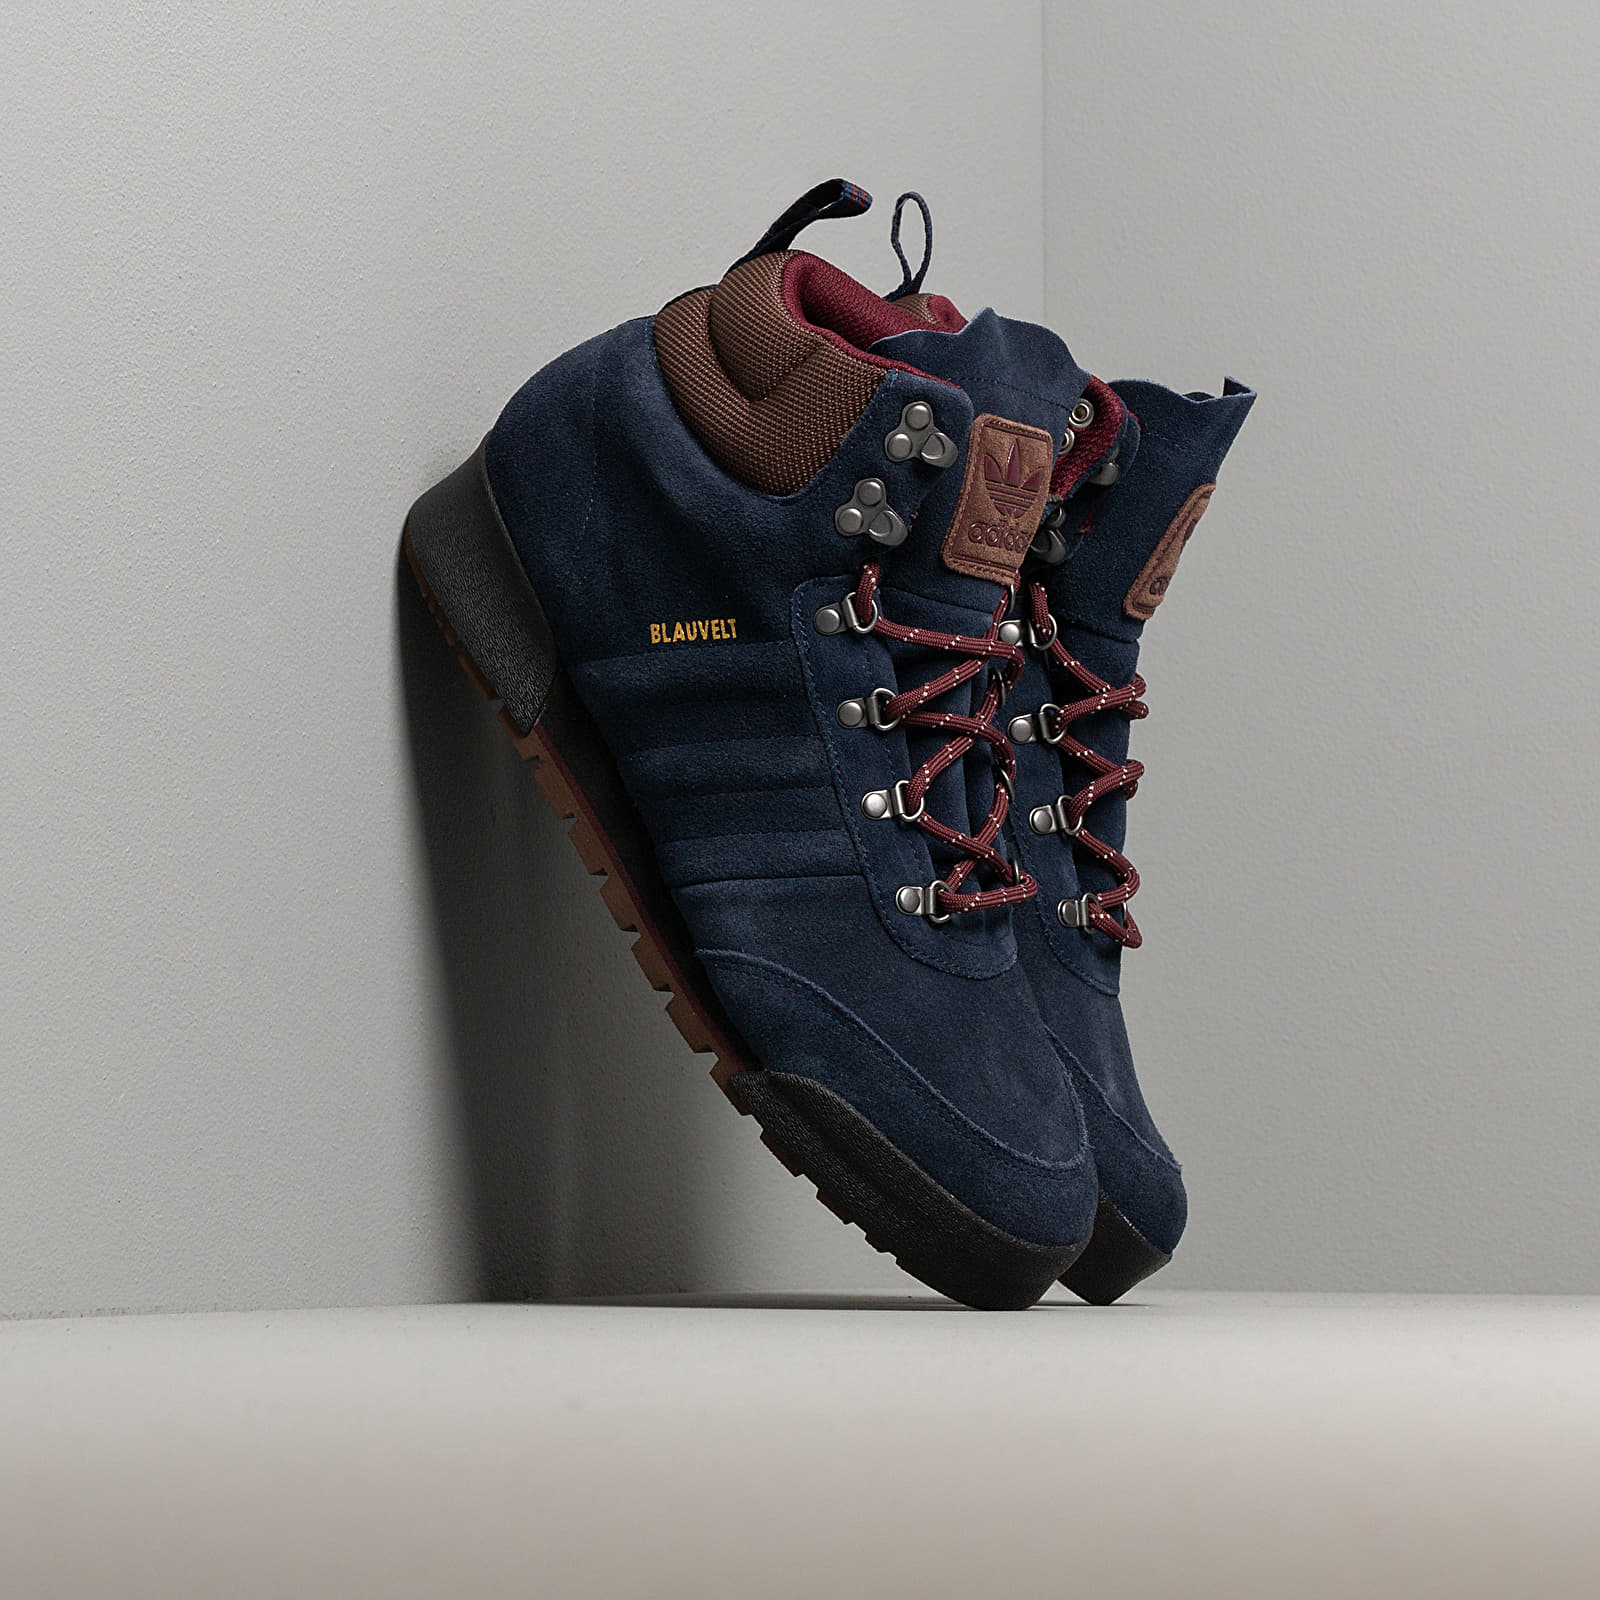 Men's shoes adidas Jake Boot 2.0 Collegiate Navy/ Maroon/ Brown